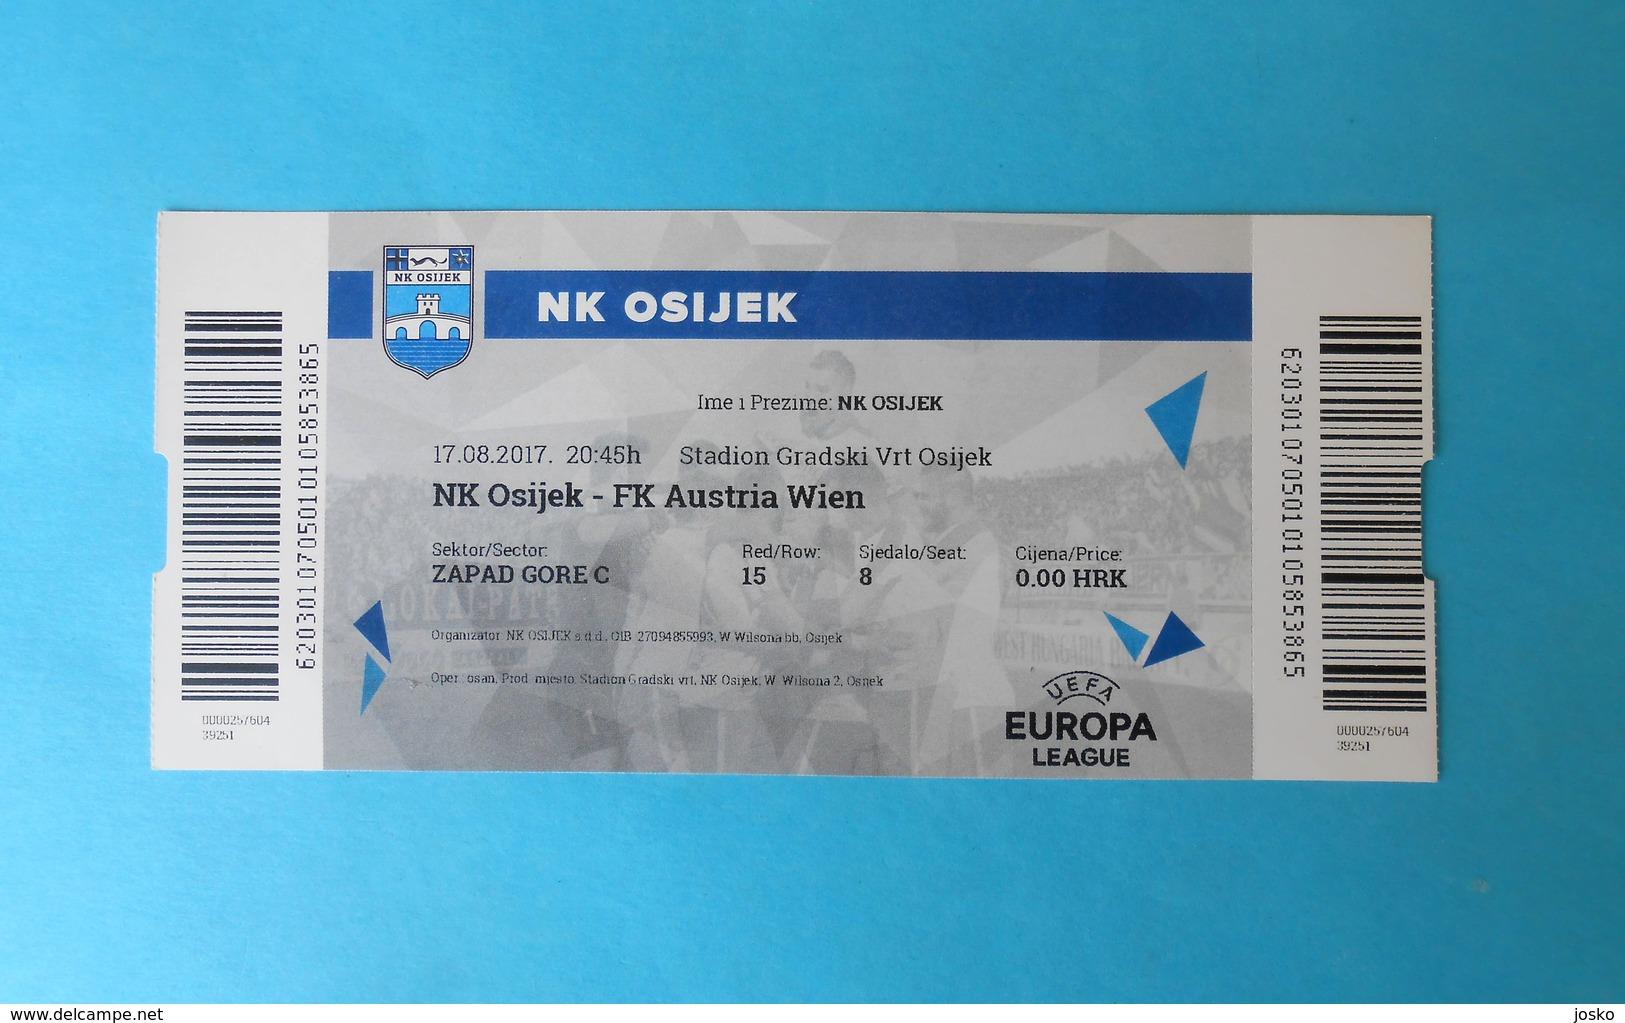 NkOSIJEK V FK AUSTRIA WIEN - 2017 UEFA EUROPA LEAGUE Football Match Ticket Soccer Fussball Foot Calcio Billet Osterreich - Match Tickets